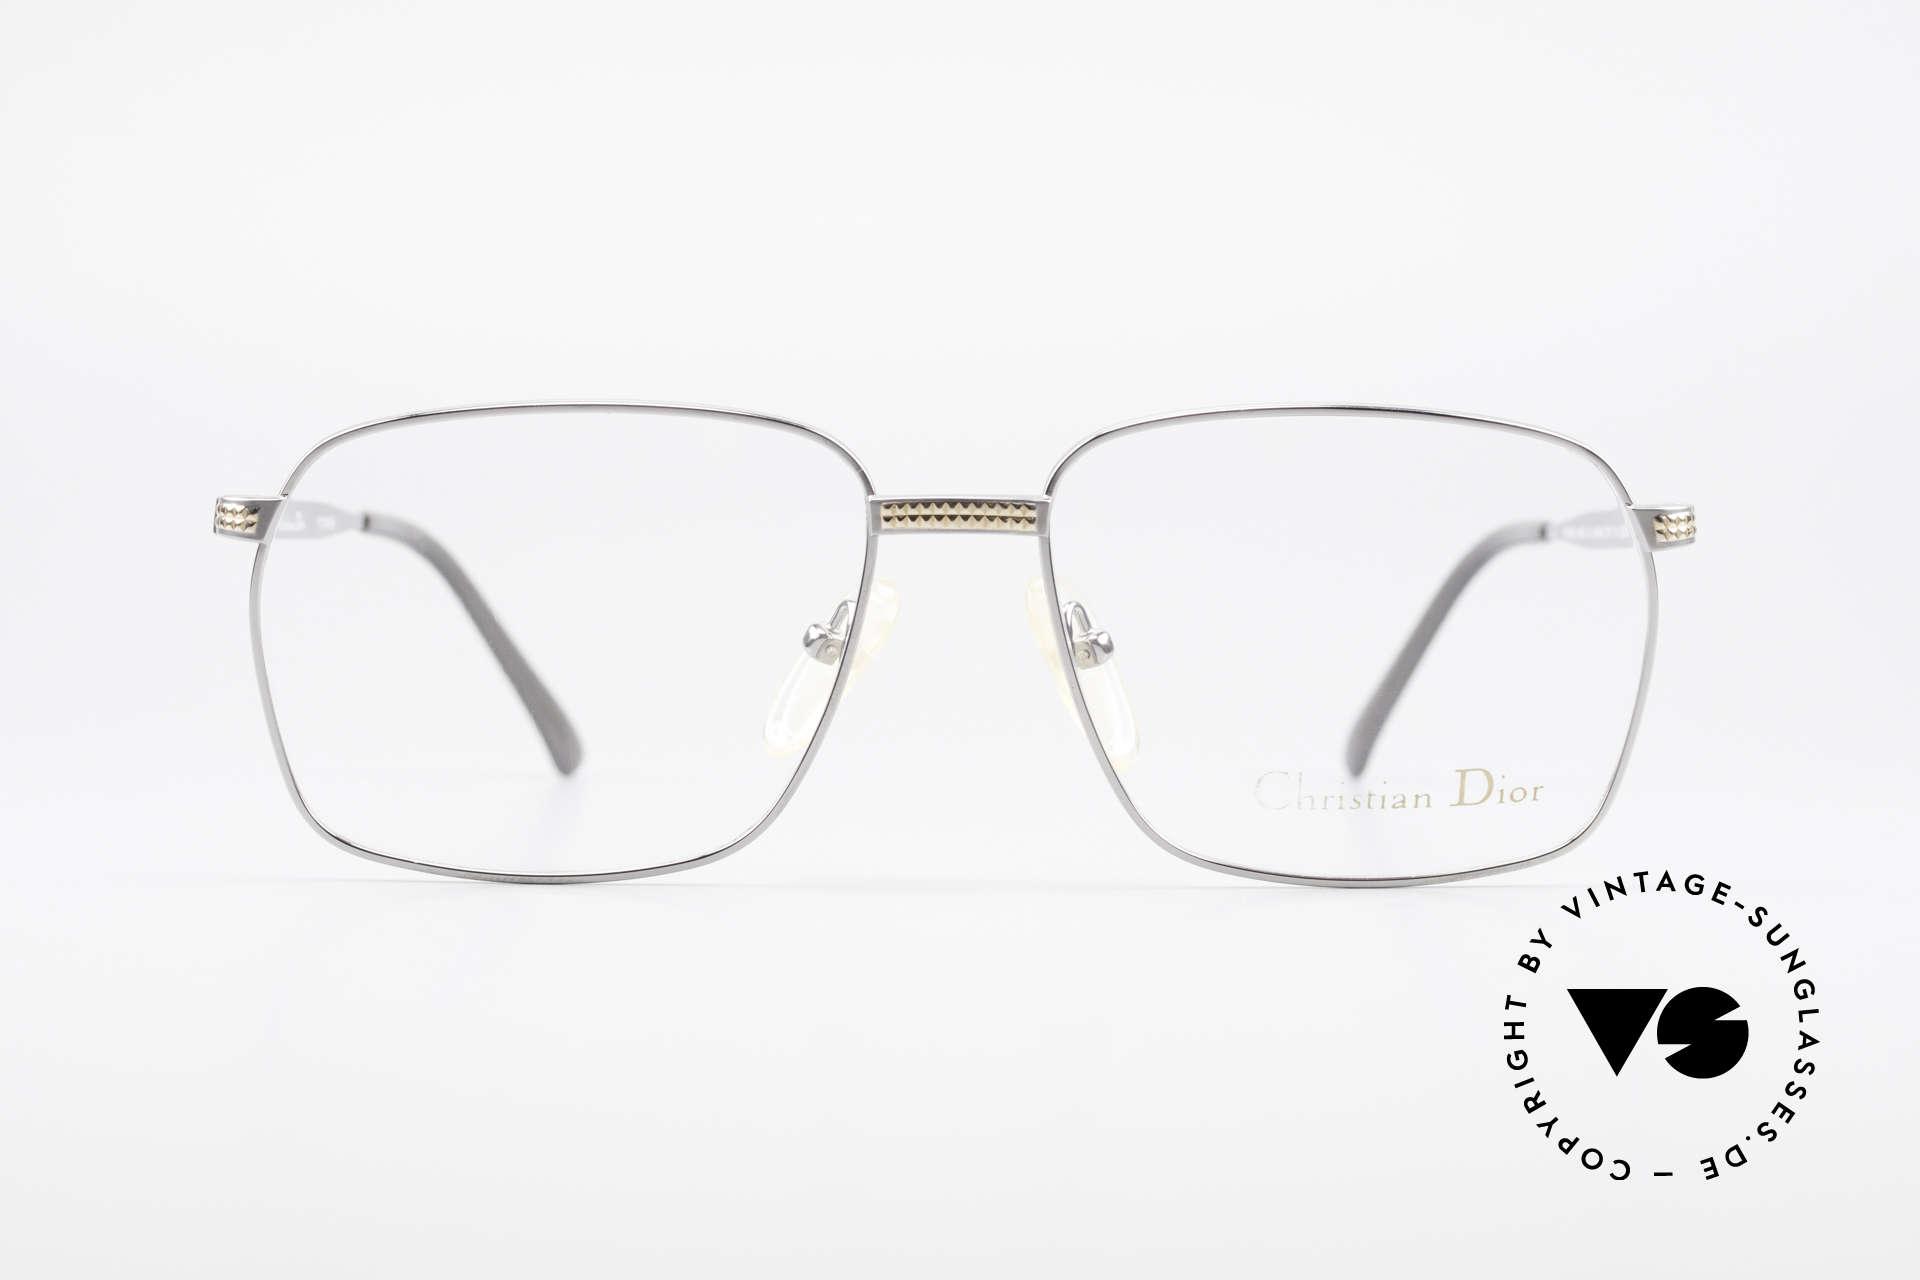 Christian Dior 2791 Titanium Eyeglass-Frame 90's, titanium metal frame with particular gravure; high-end, Made for Men